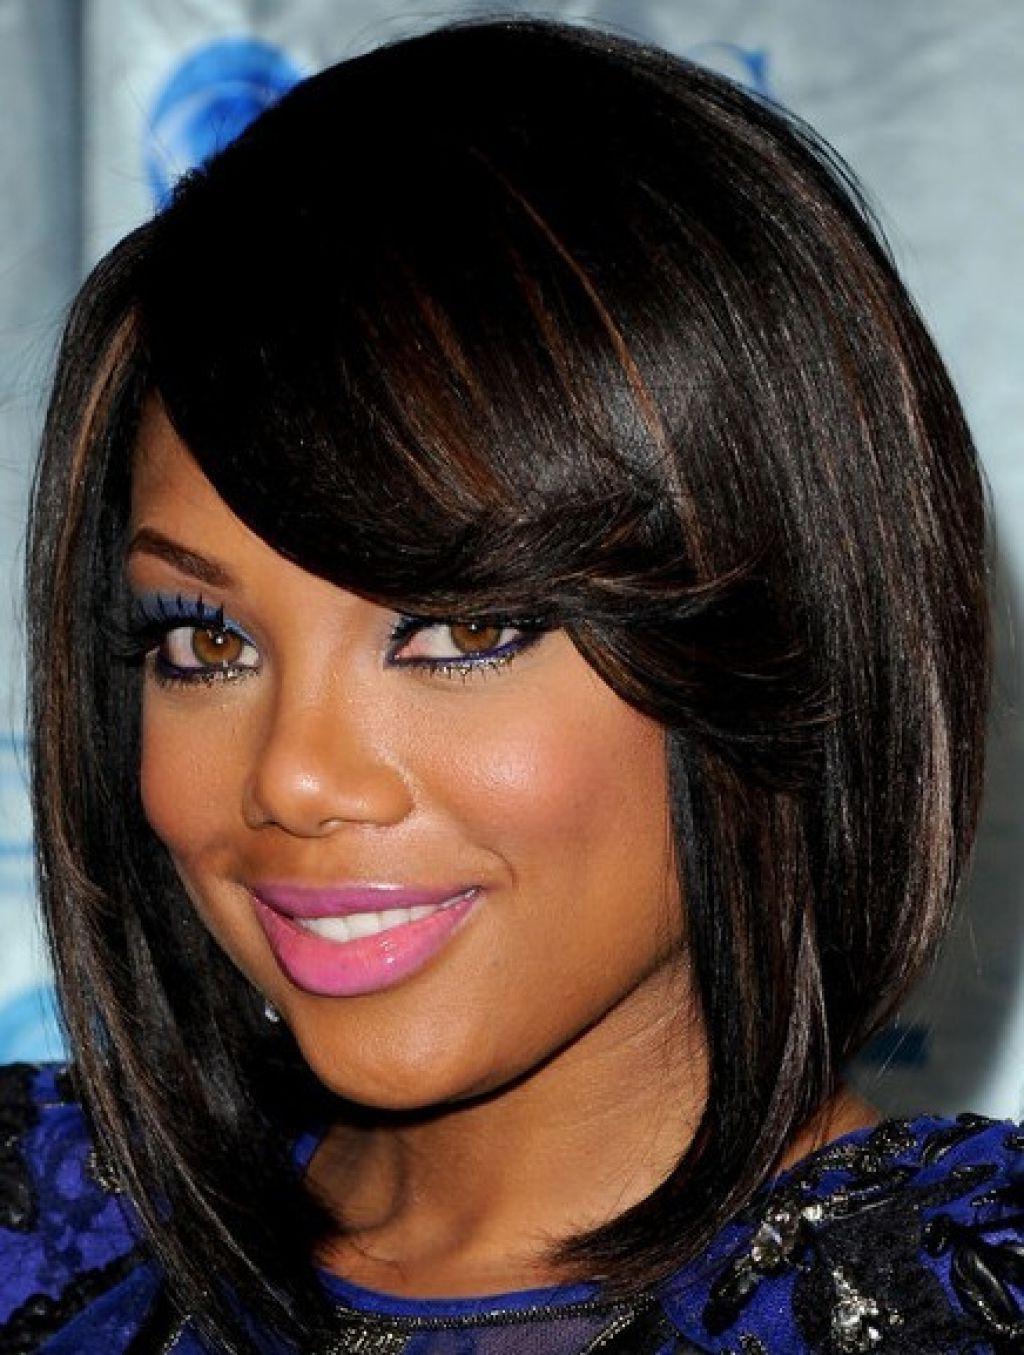 Trendy Medium Hairstyles For Black Ladies Within 27 Short Hairstyles And Haircuts For Black Women Of Class (View 16 of 20)